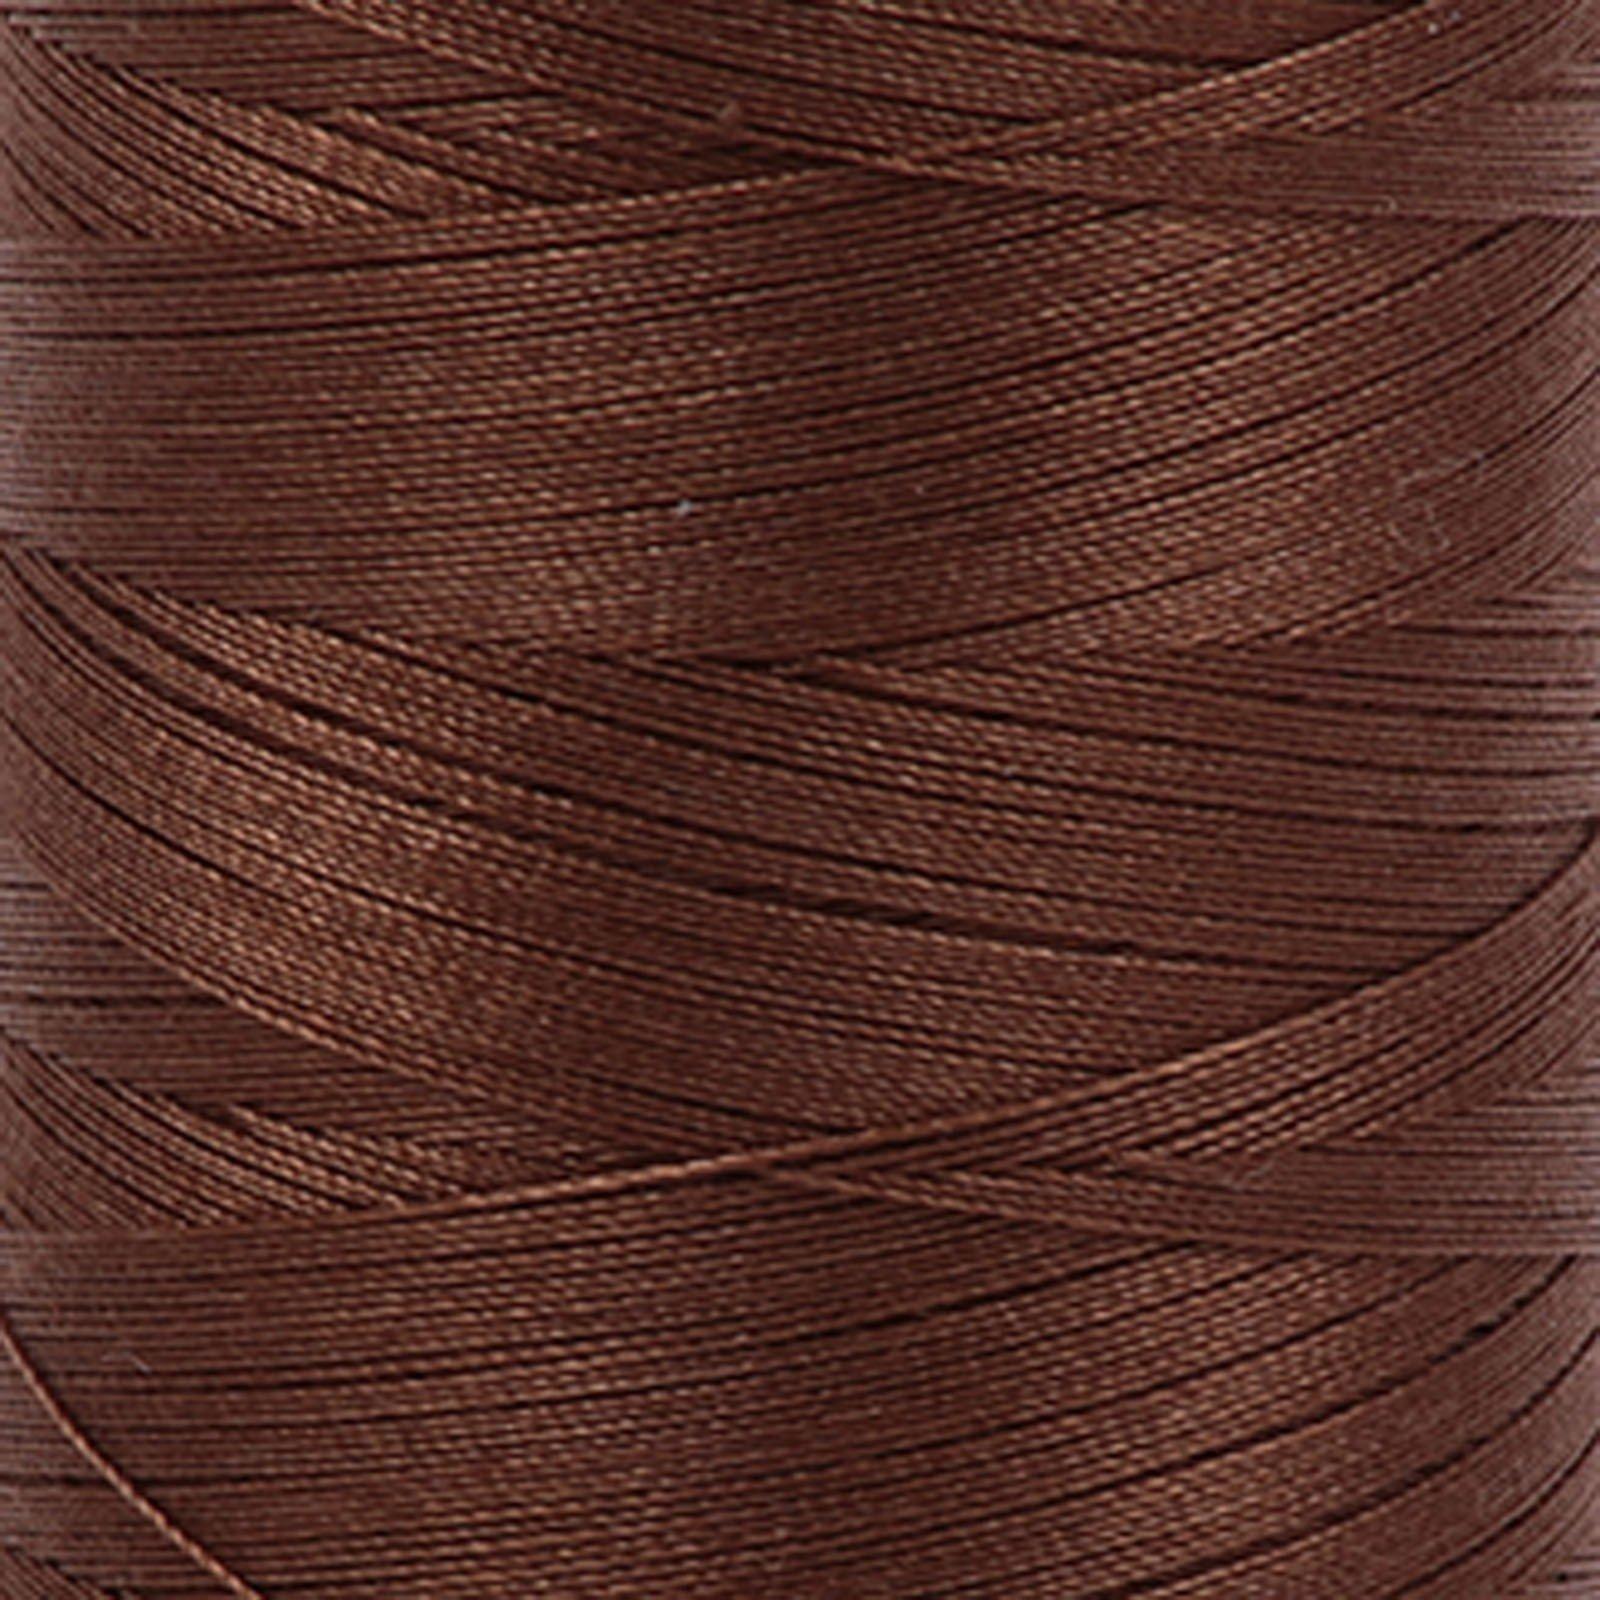 Aurifil Cotton 2372 Dark Antique Gold 50wt 220 yds